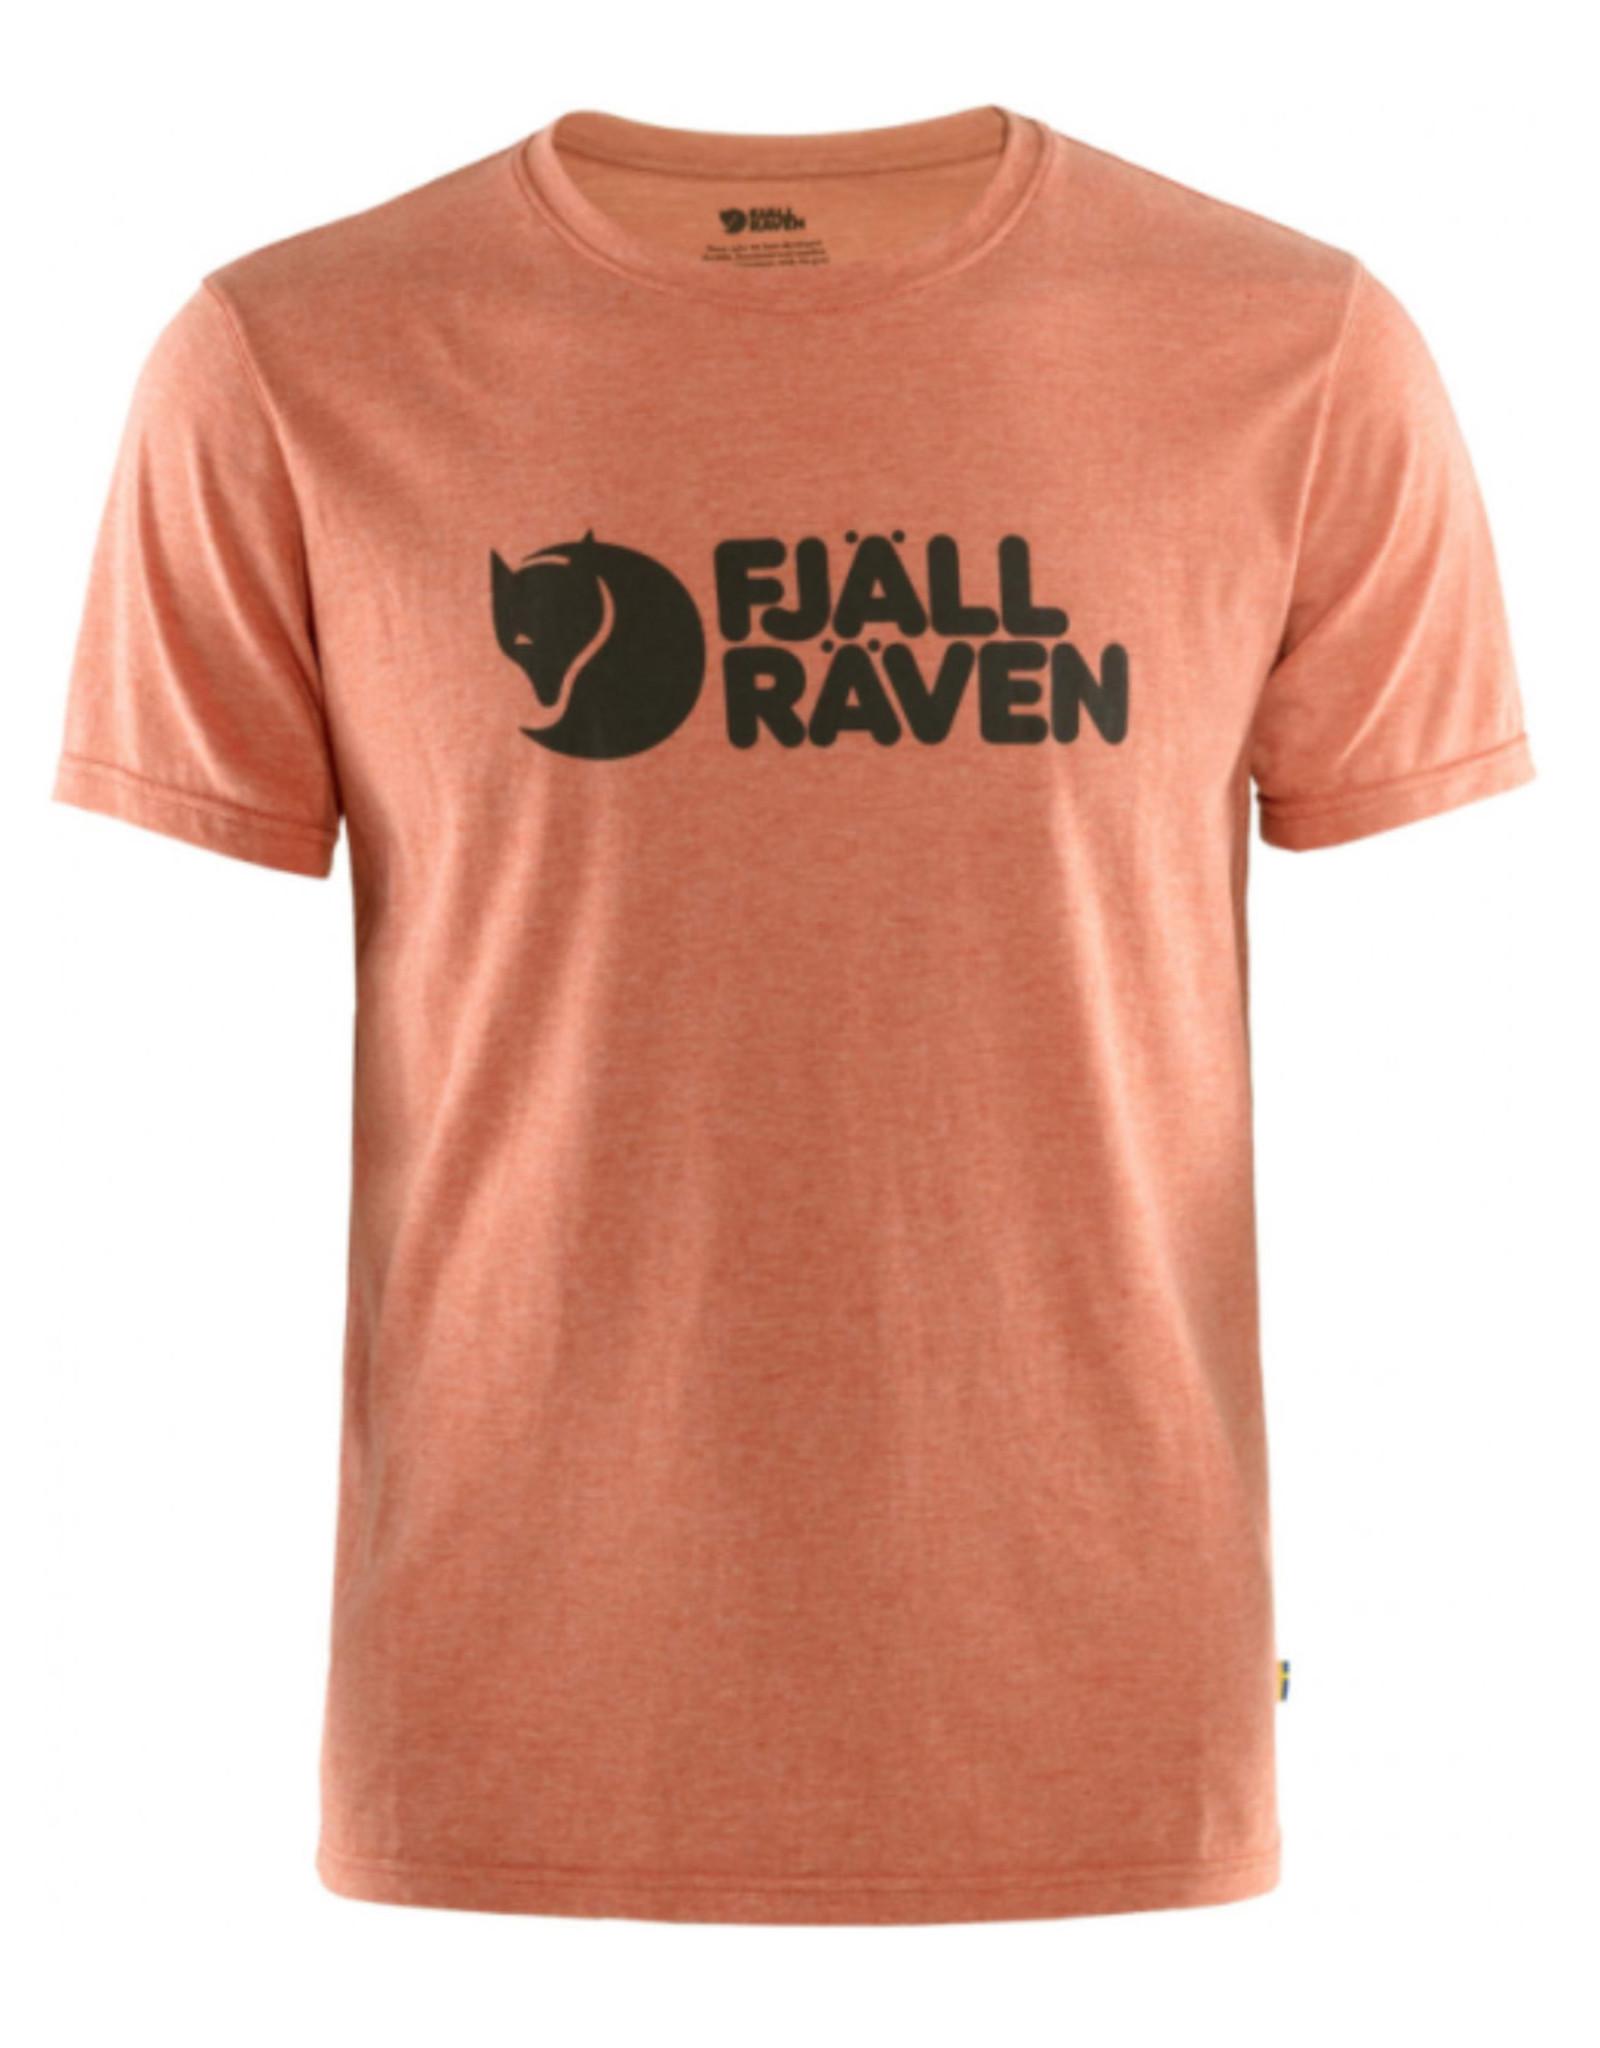 FJALL RAVEN Logo Tee